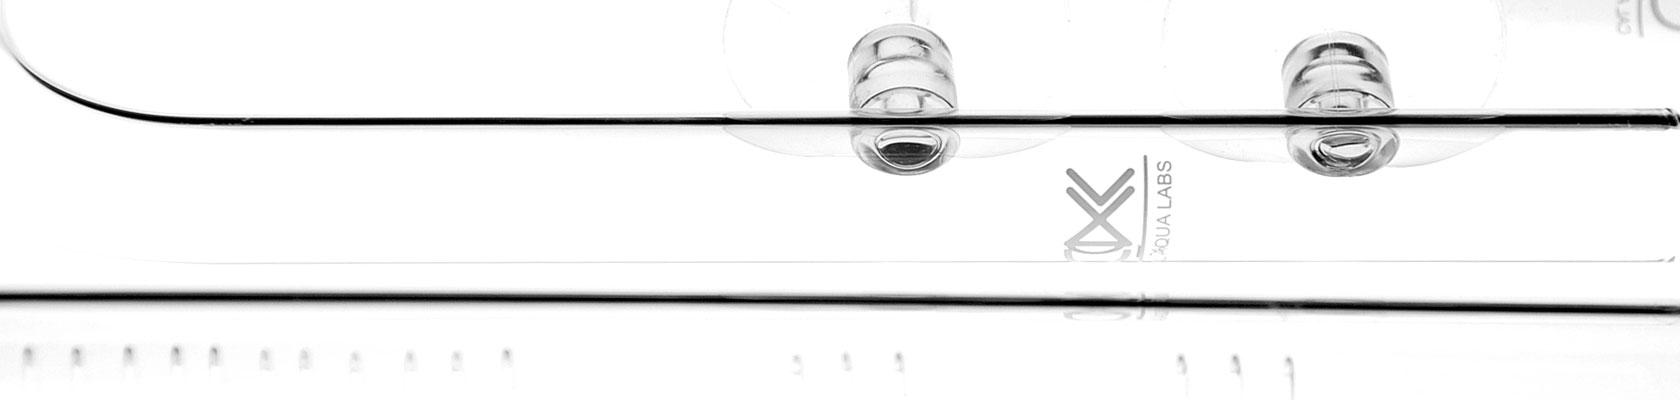 glassware_banner1